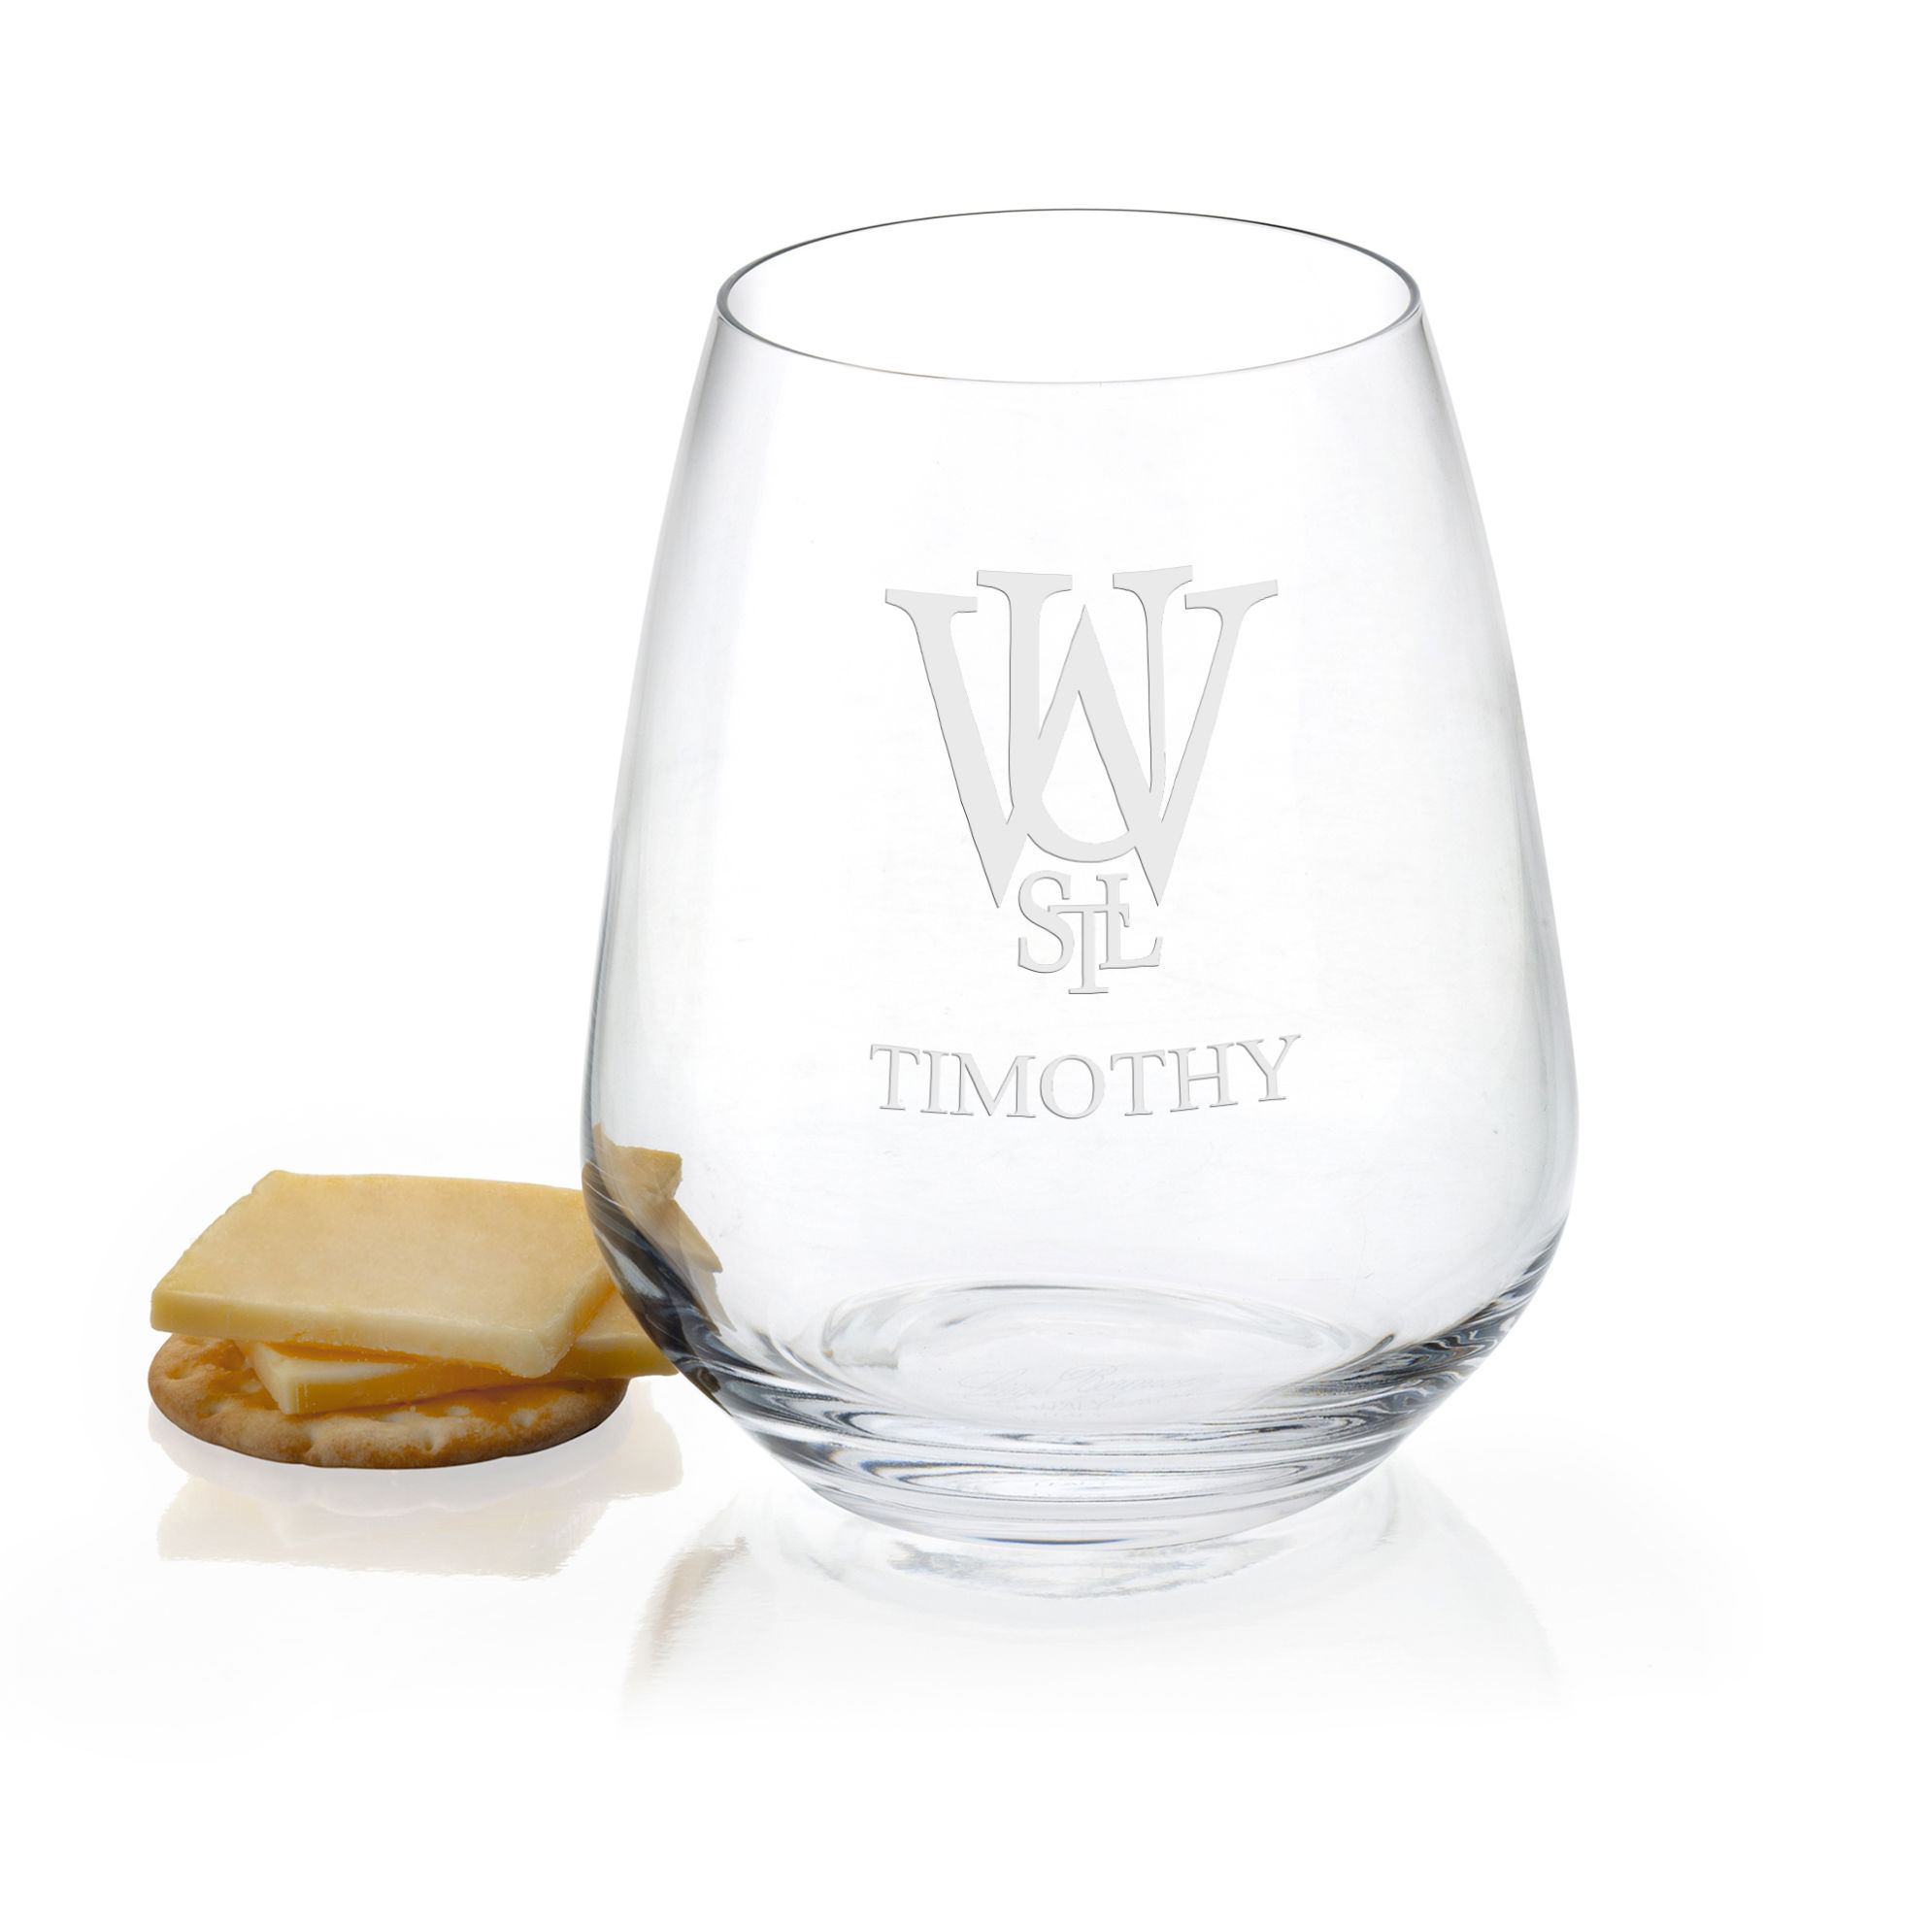 WUSTL Stemless Wine Glasses - Set of 4